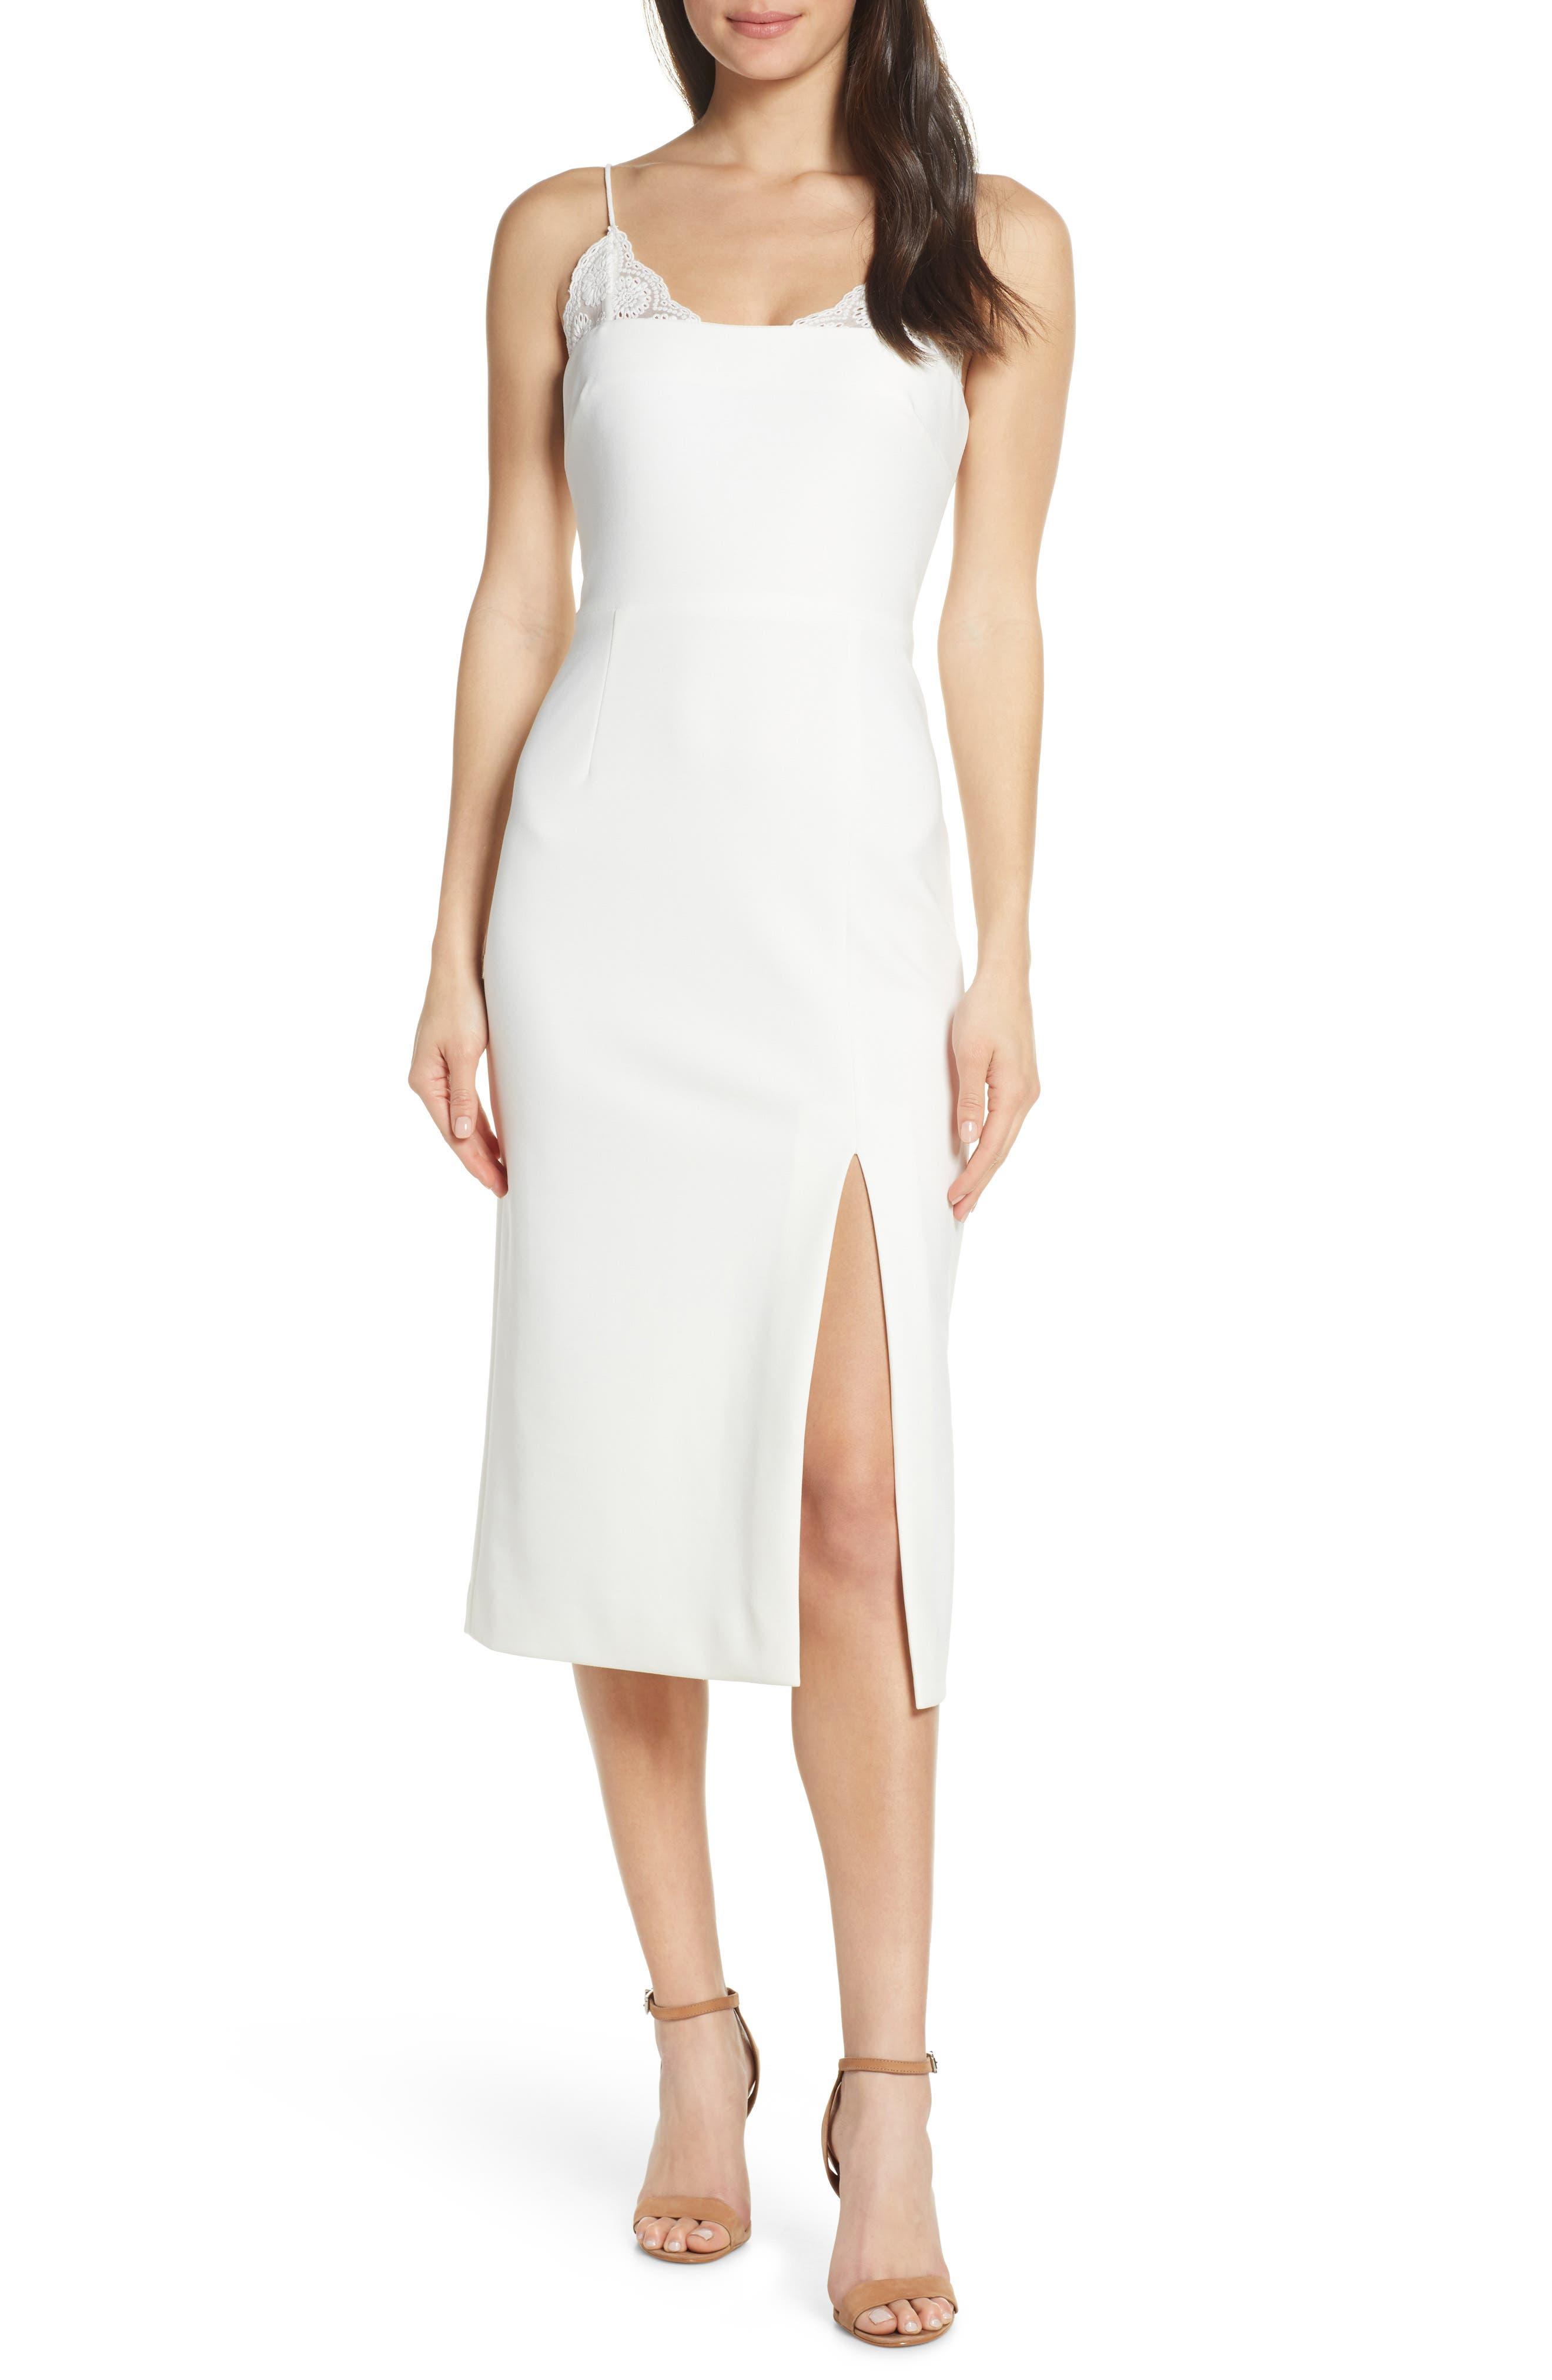 Finders Keepers Kobie Midi Dress, Ivory